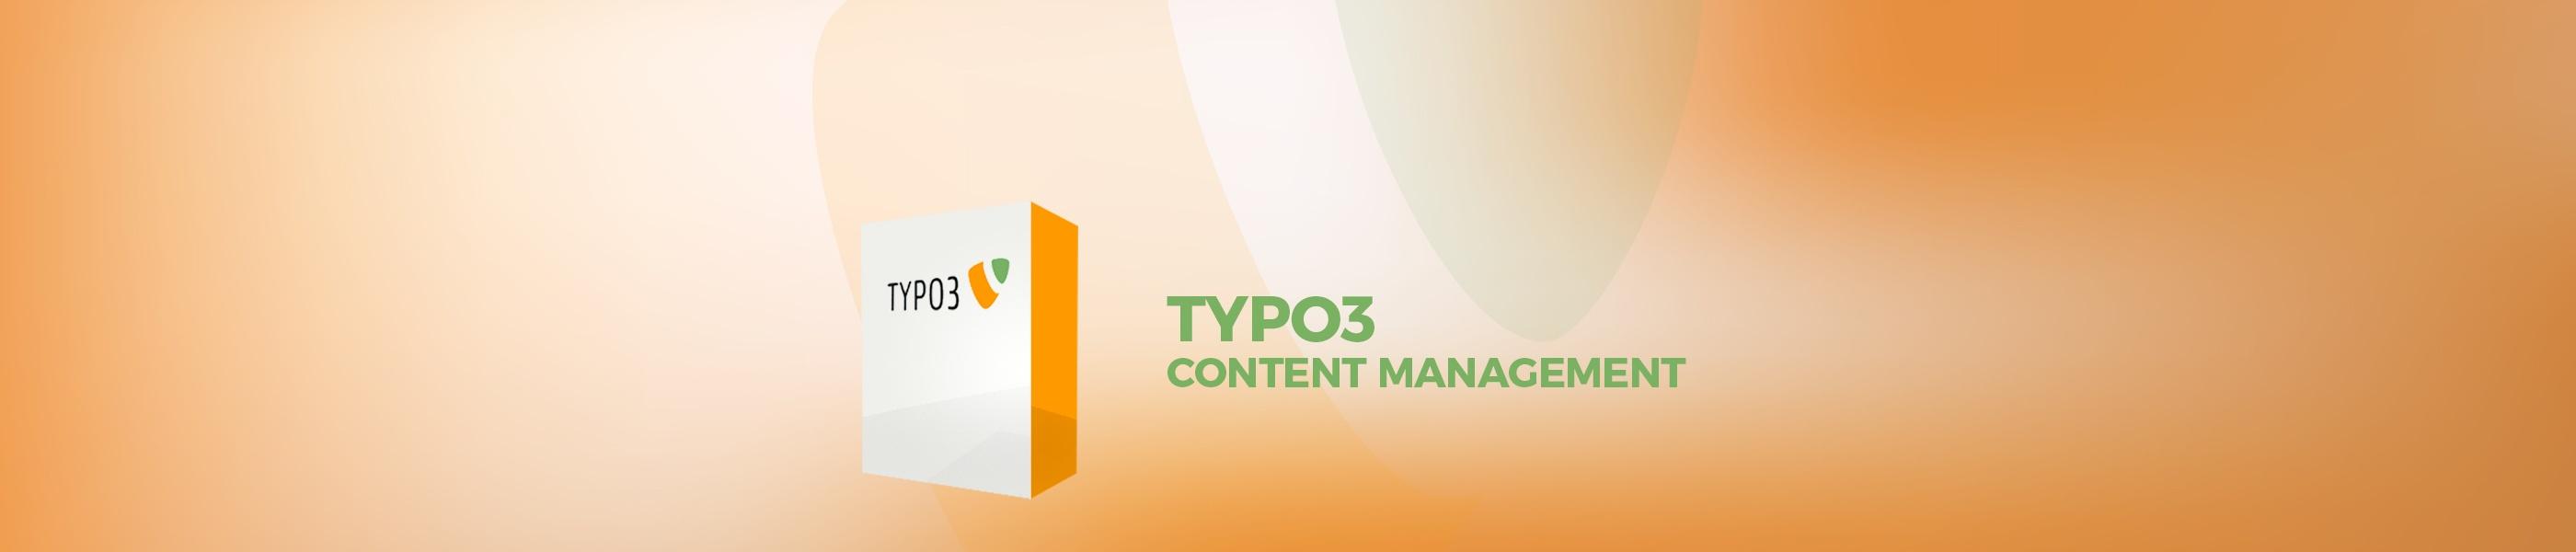 180108_Produkte_Typo3.jpg